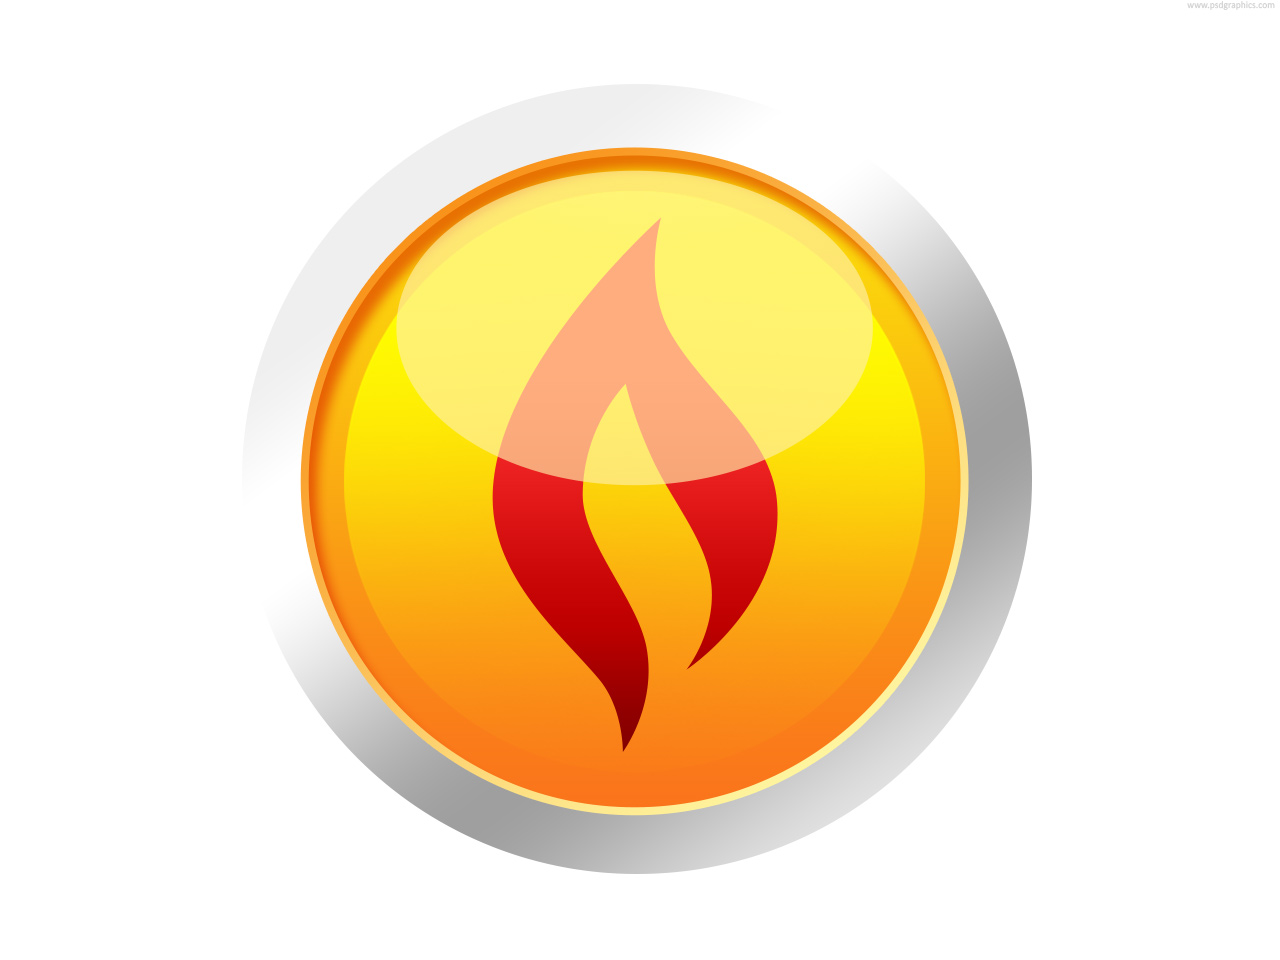 16 Flame Icons PSD Images - Fire Flames Clip Art Symbol ... | 1280 x 960 jpeg 99kB